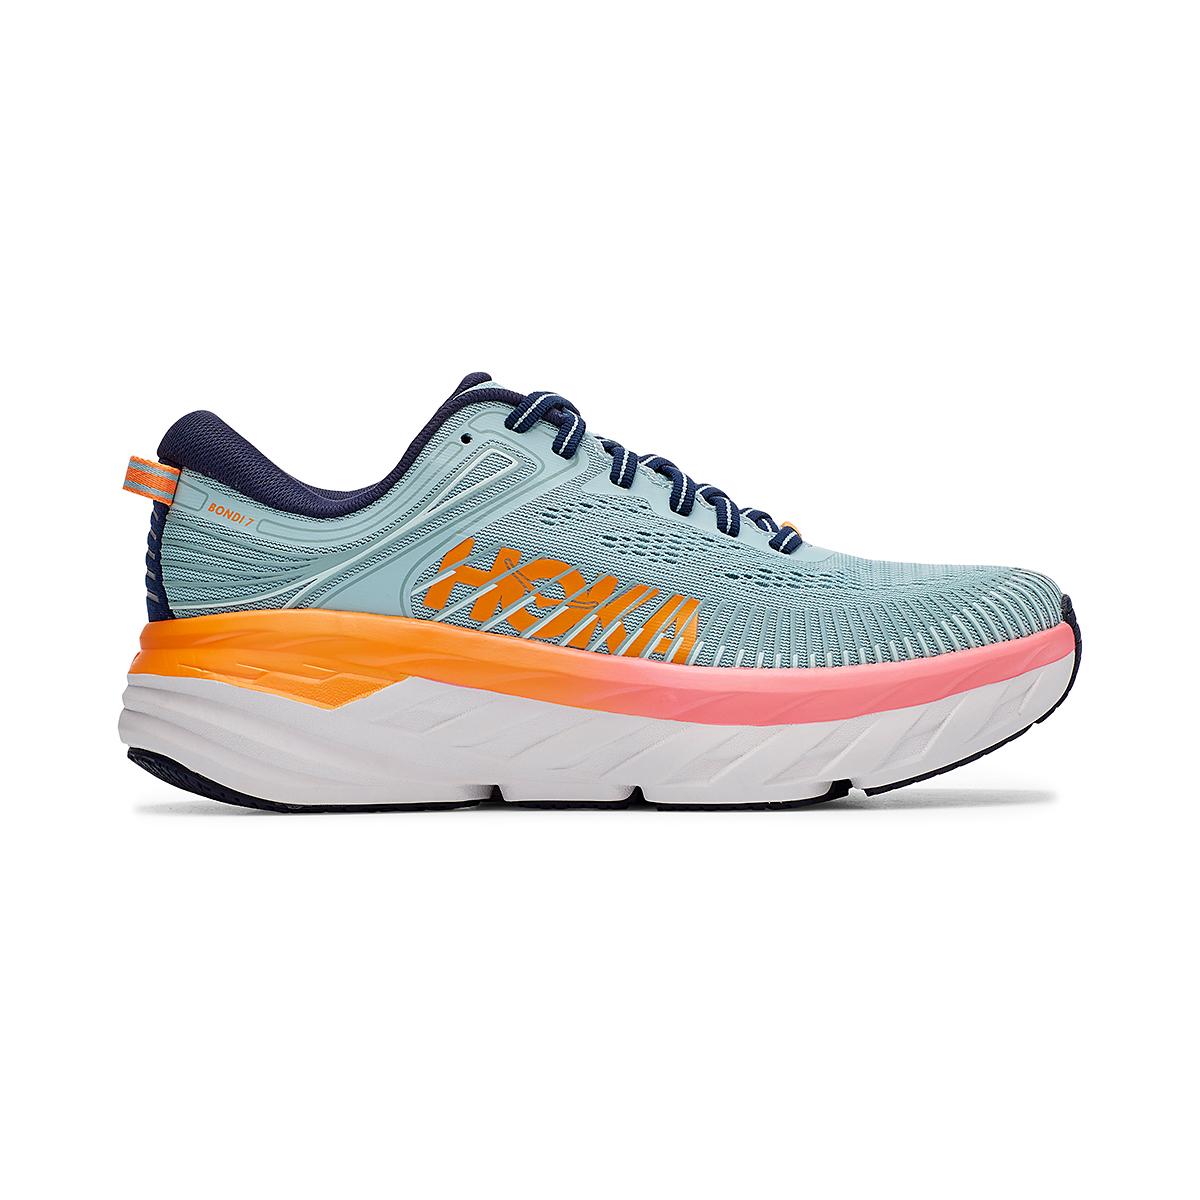 Women's Hoka One One Bondi 7 Running Shoe - Color: Blue Haze/Black Iris - Size: 5.5 - Width: Regular, Blue Haze/Black Iris, large, image 1